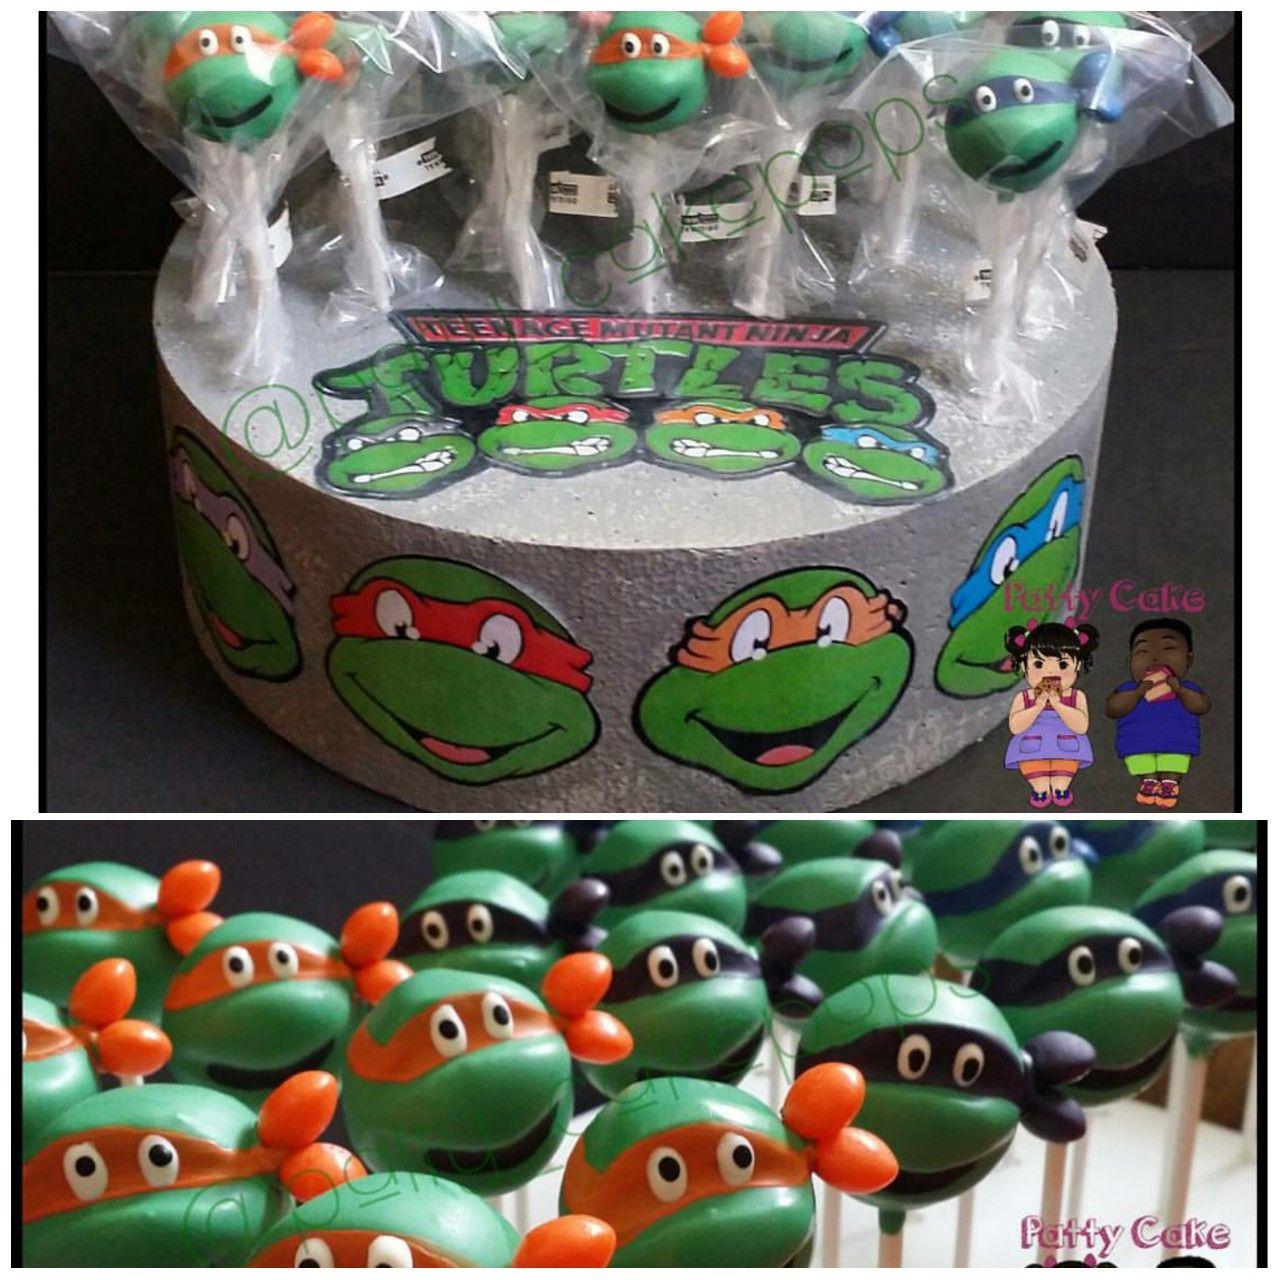 Teenage Mutant Ninja Turtle Cake Pops With Custom Display By Patty Cakepops Mutant Ninja Turtles Cake Teenage Mutant Ninja Turtle Cake Ninja Turtle Cake